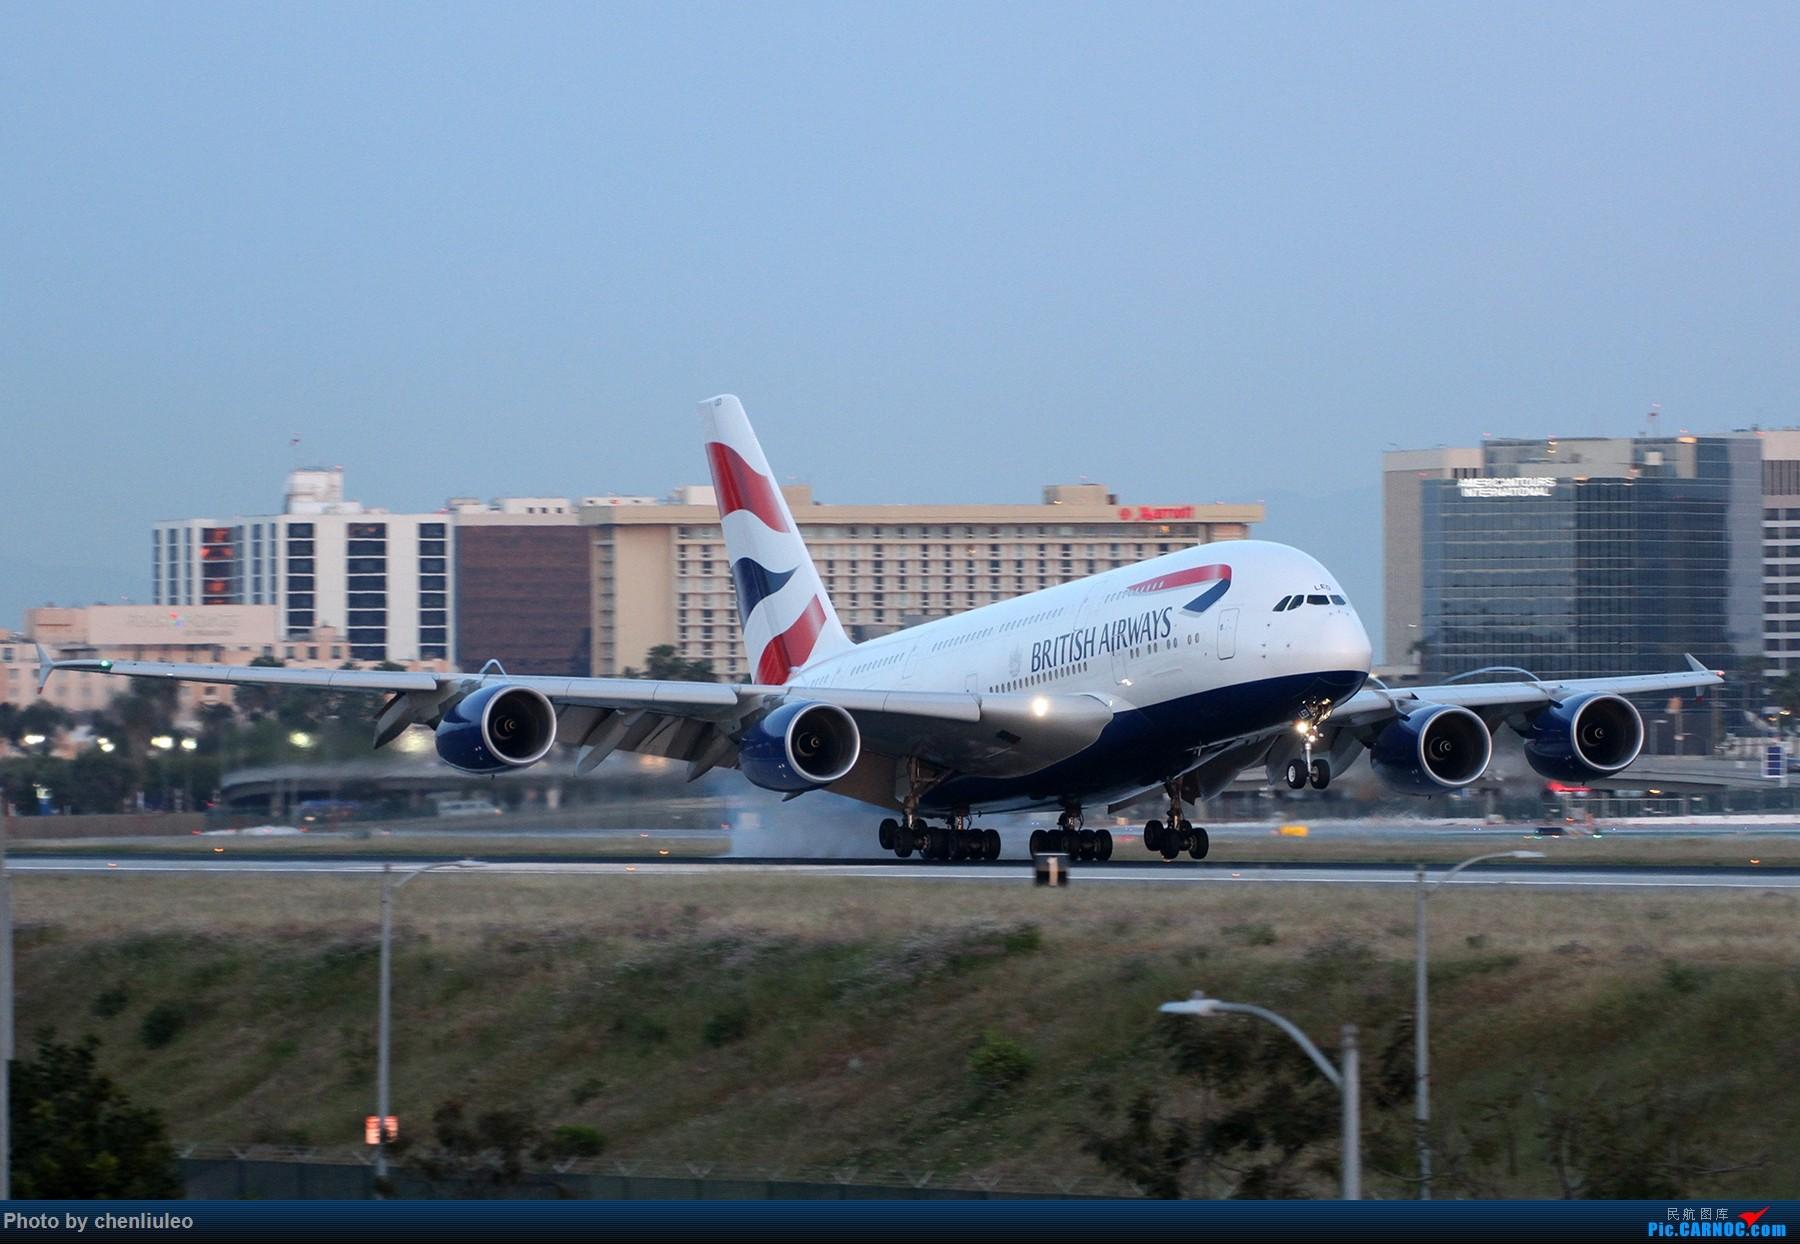 Re:[原创]【北美飞友会】洛杉矶世界机场黄昏随拍 AIRBUS A380-800 G-XLED 美国洛杉矶机场